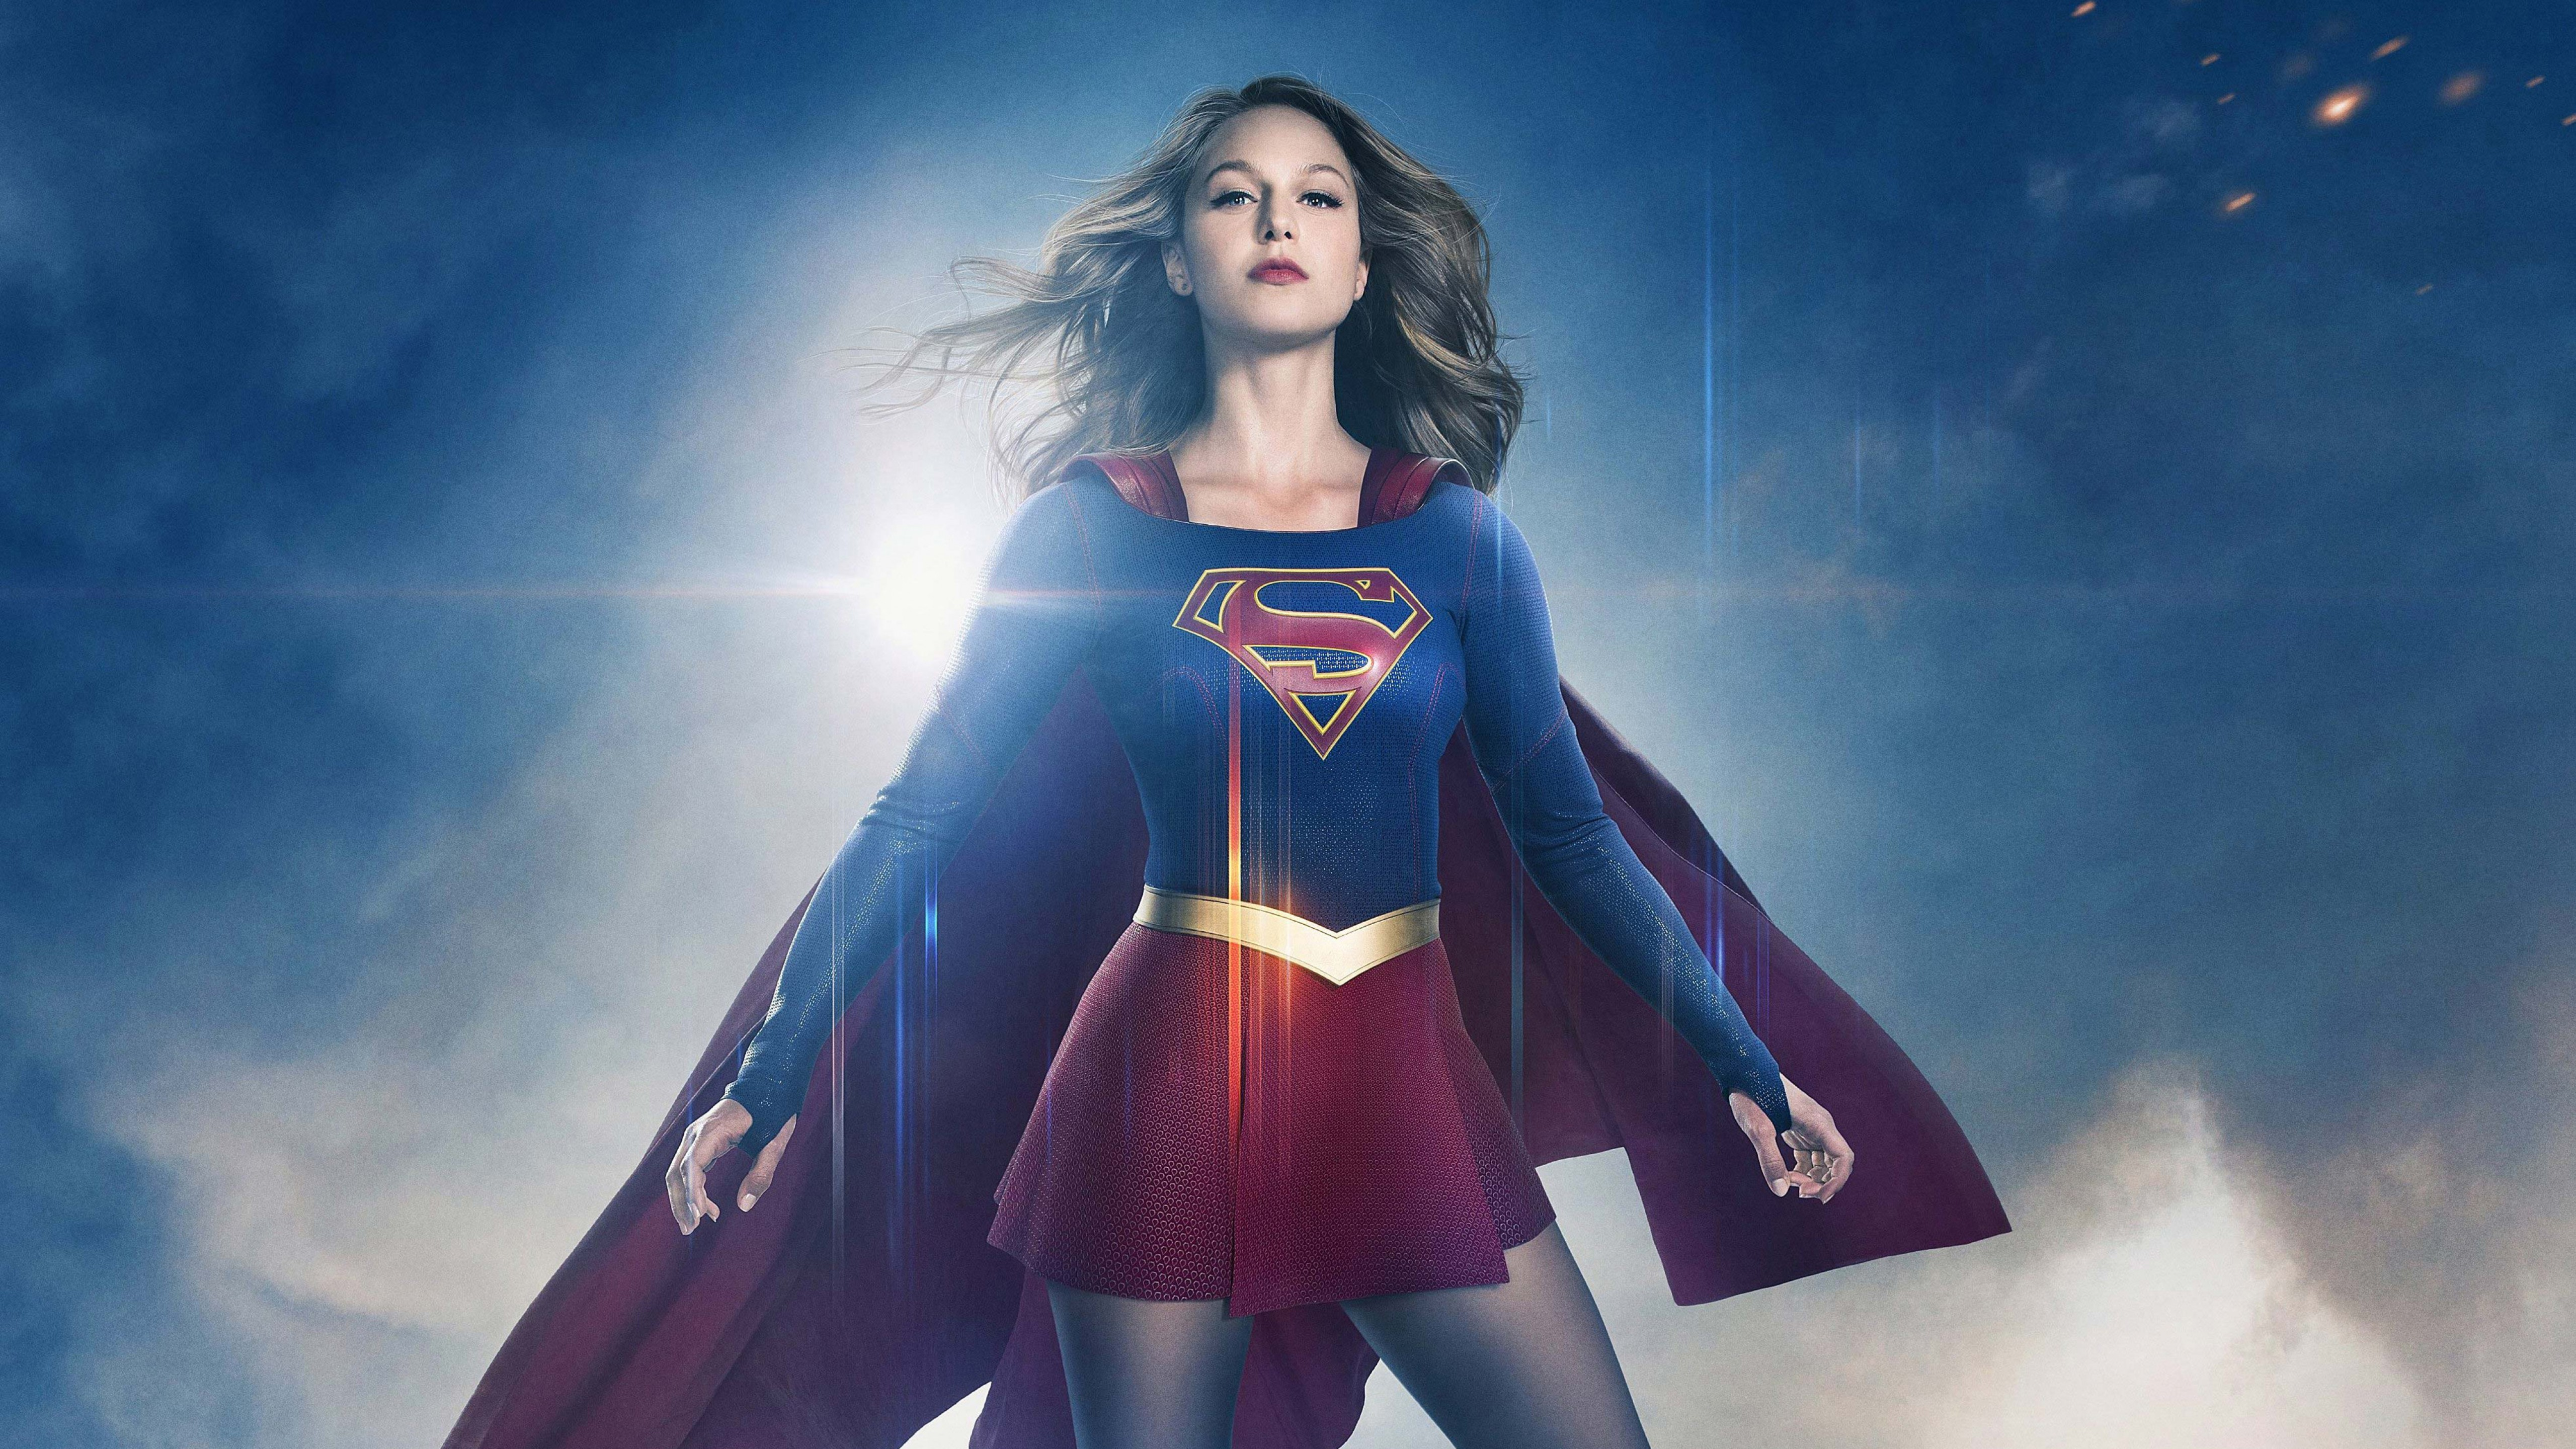 Supergirl Season 4 Netflix 5120x2880 Wallpaper Teahub Io